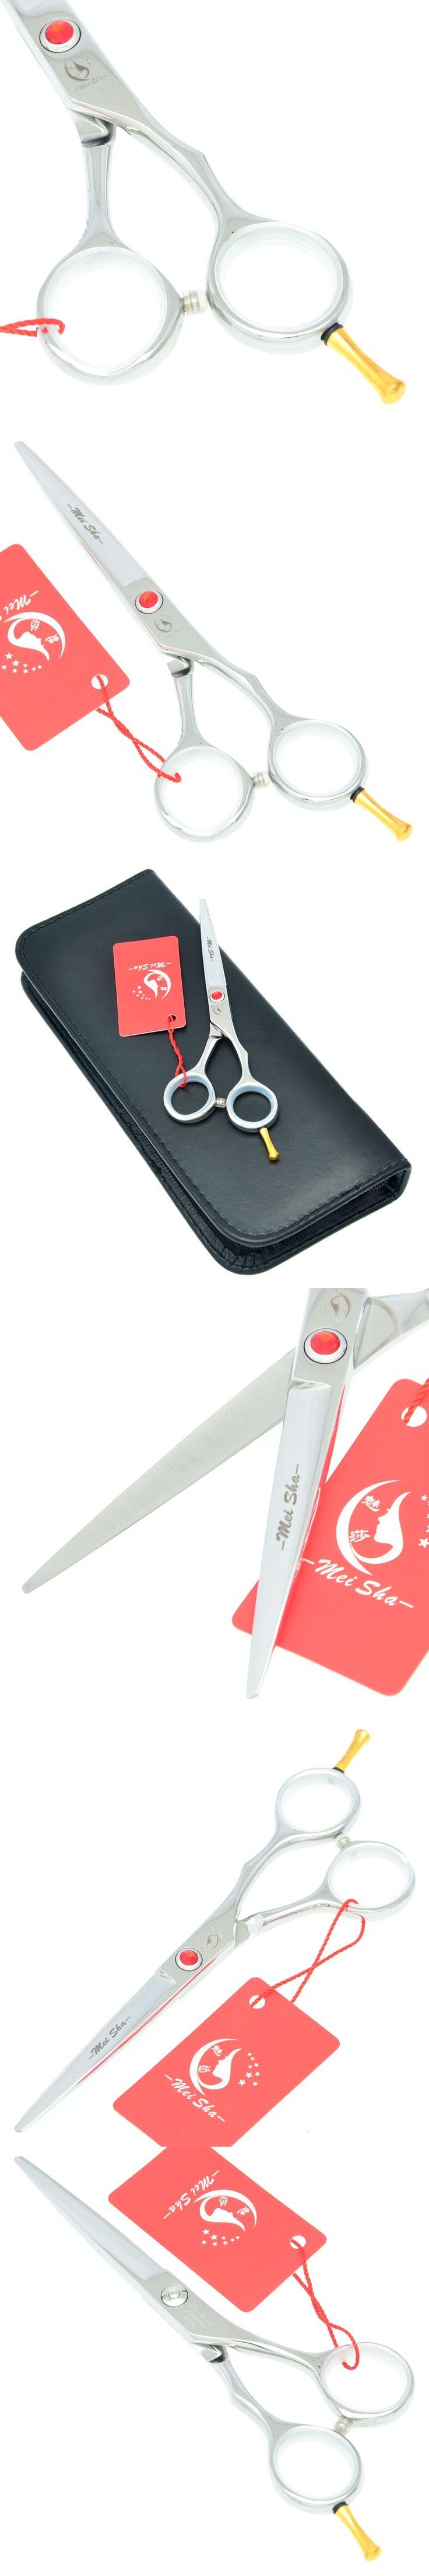 "5.5"" Meisha Professional Hair Cutting Scissors JP440C Hairdressing Scissors Hair Shears Barbers Scissors for Home Use, HA0183"